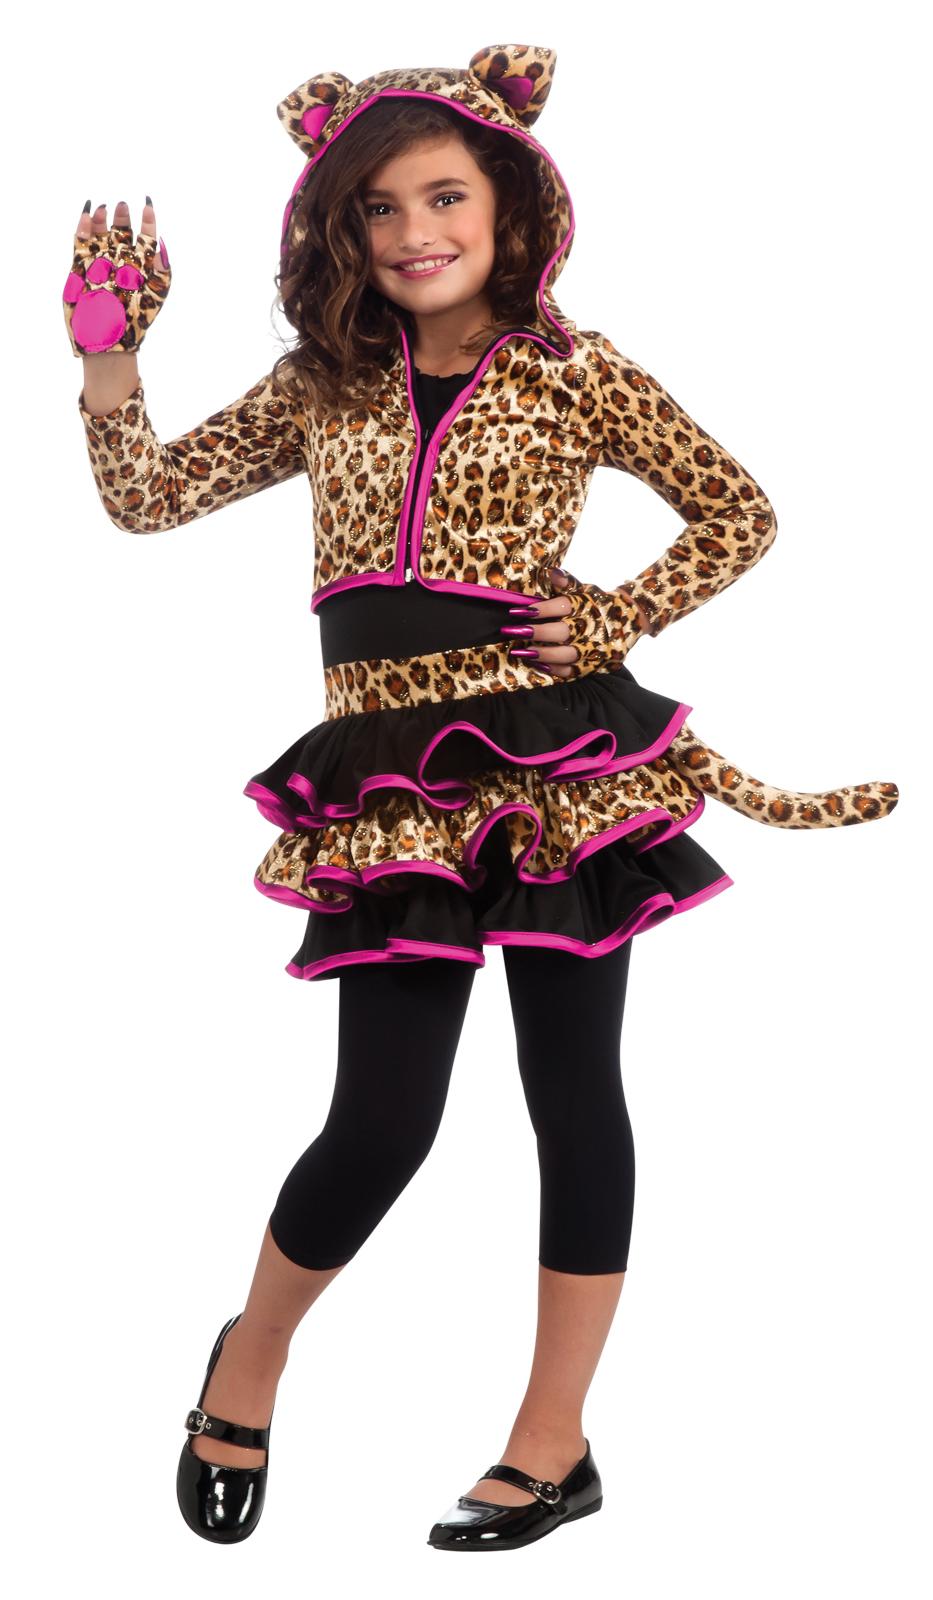 Leopard Hoodie Child Costume | BuyCostumes.com